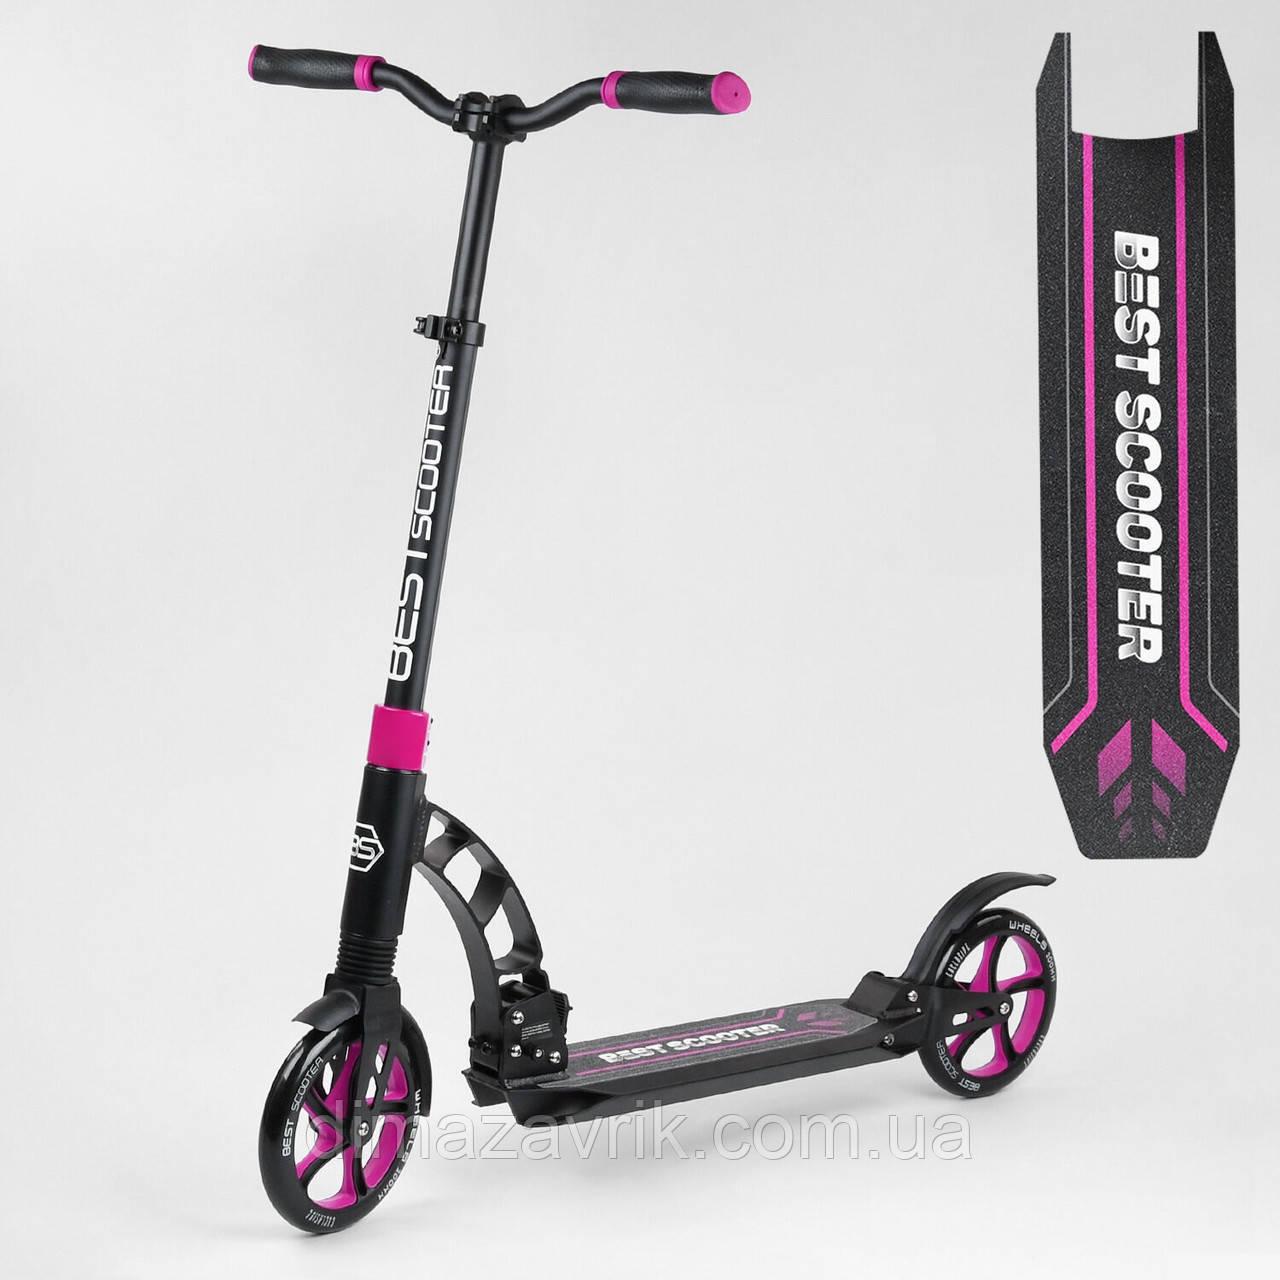 Самокат Best Scooter 48659 Розовый колеса PU - 20 см